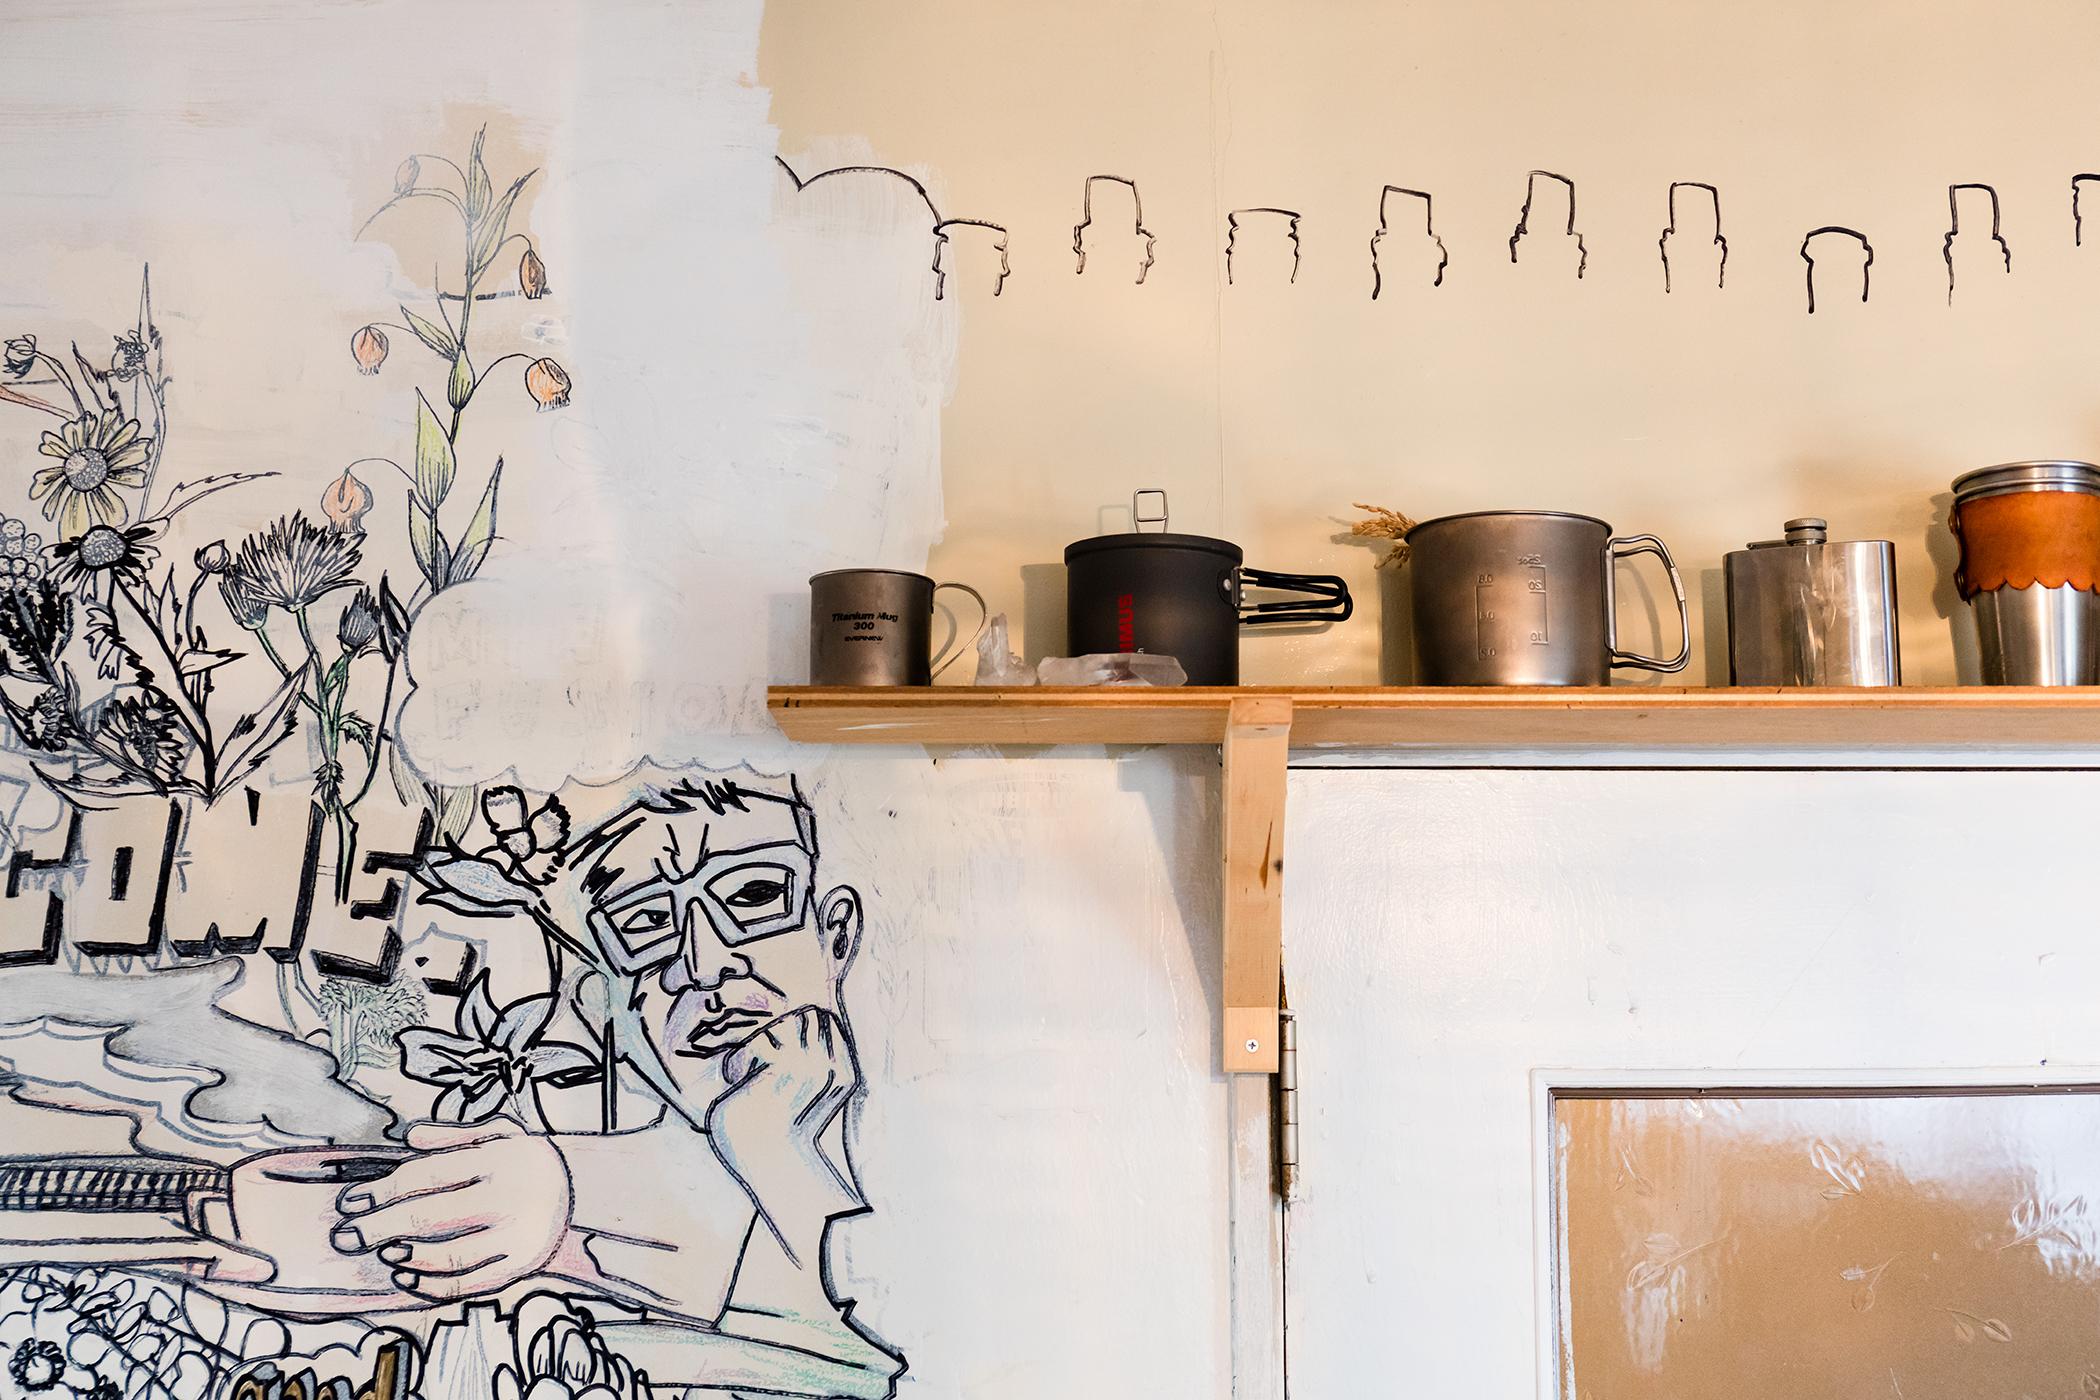 DIY可能なマンションのアートな部屋